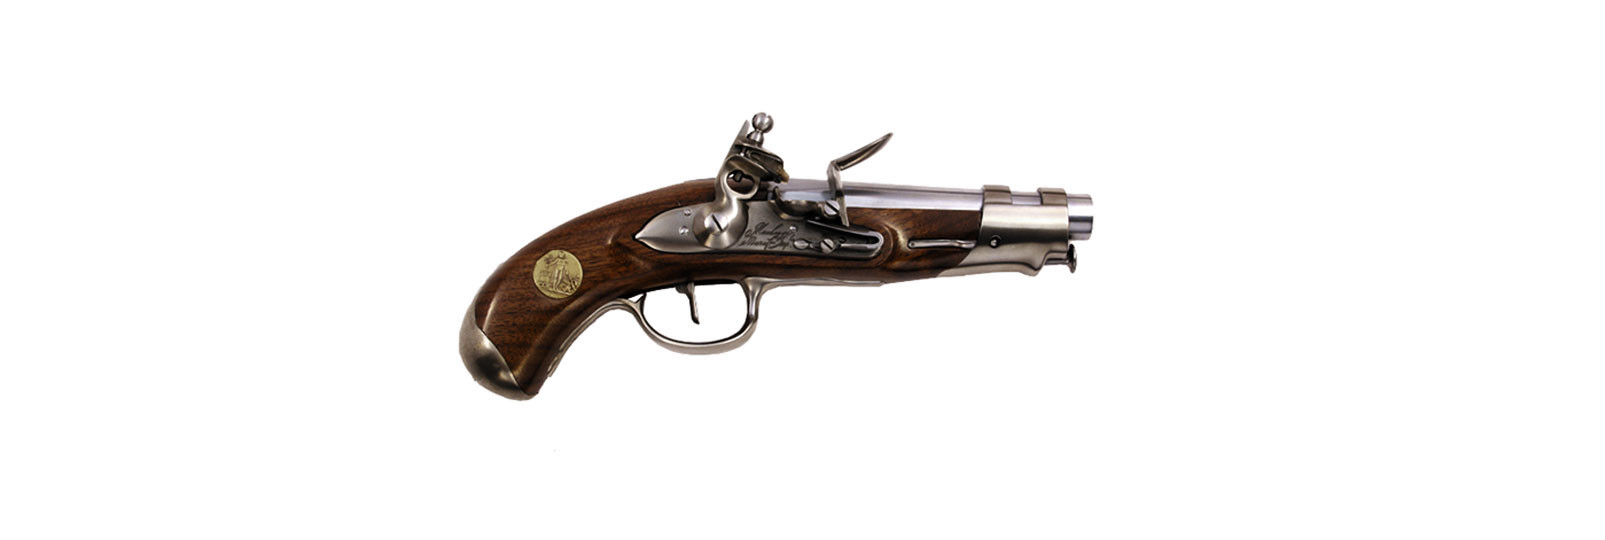 An IX De Gendarmerie Commemorative Pistol